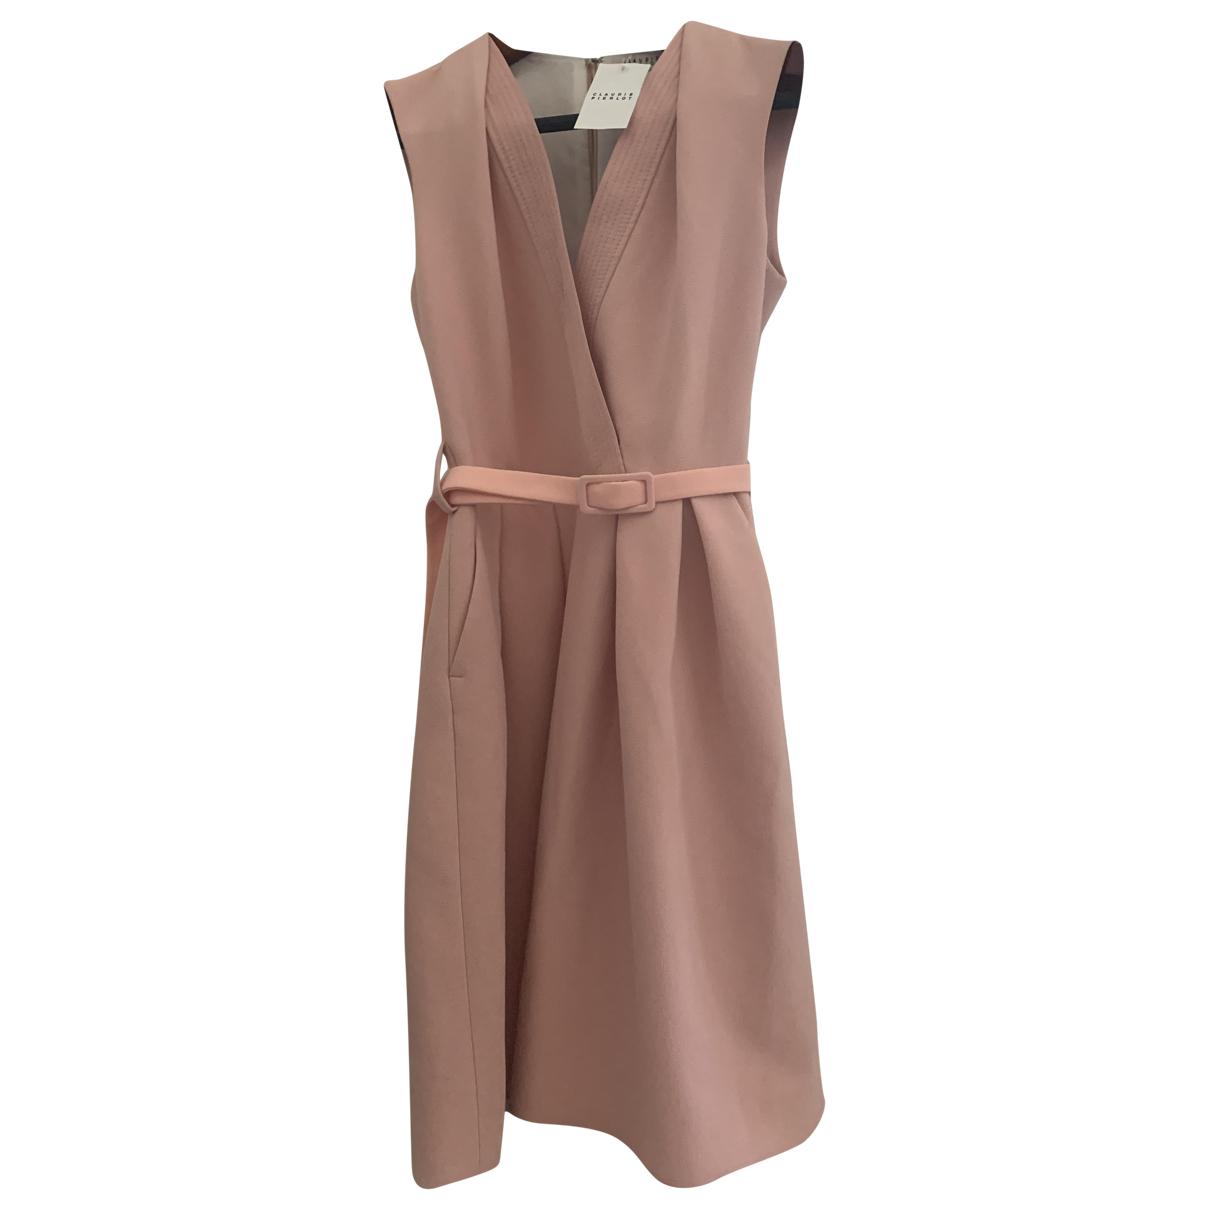 Claudie Pierlot Spring Summer 2020 Pink Cotton - elasthane dress for Women 36 FR